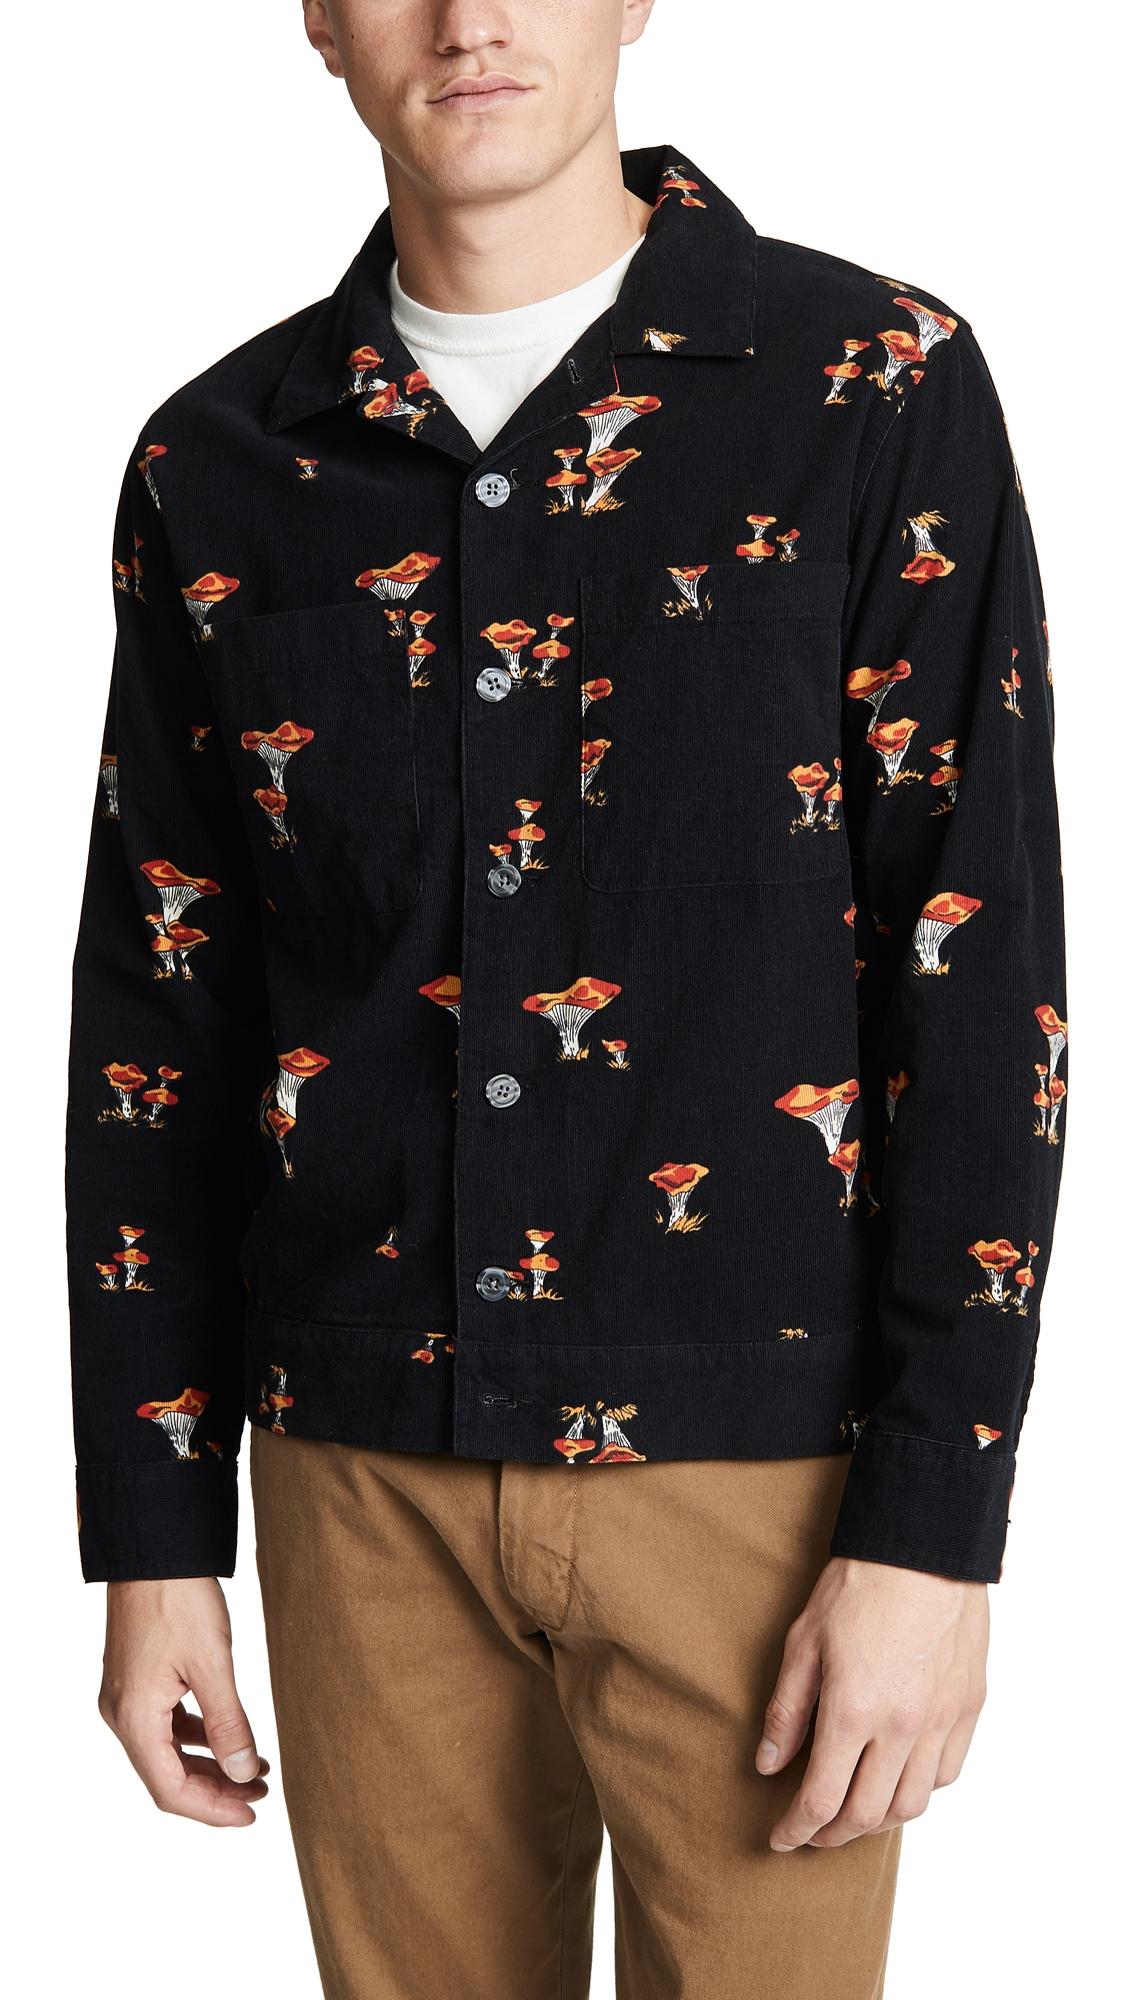 STUSSY Regular-Fit Mushroom-Print Corduroy Shirt in Black